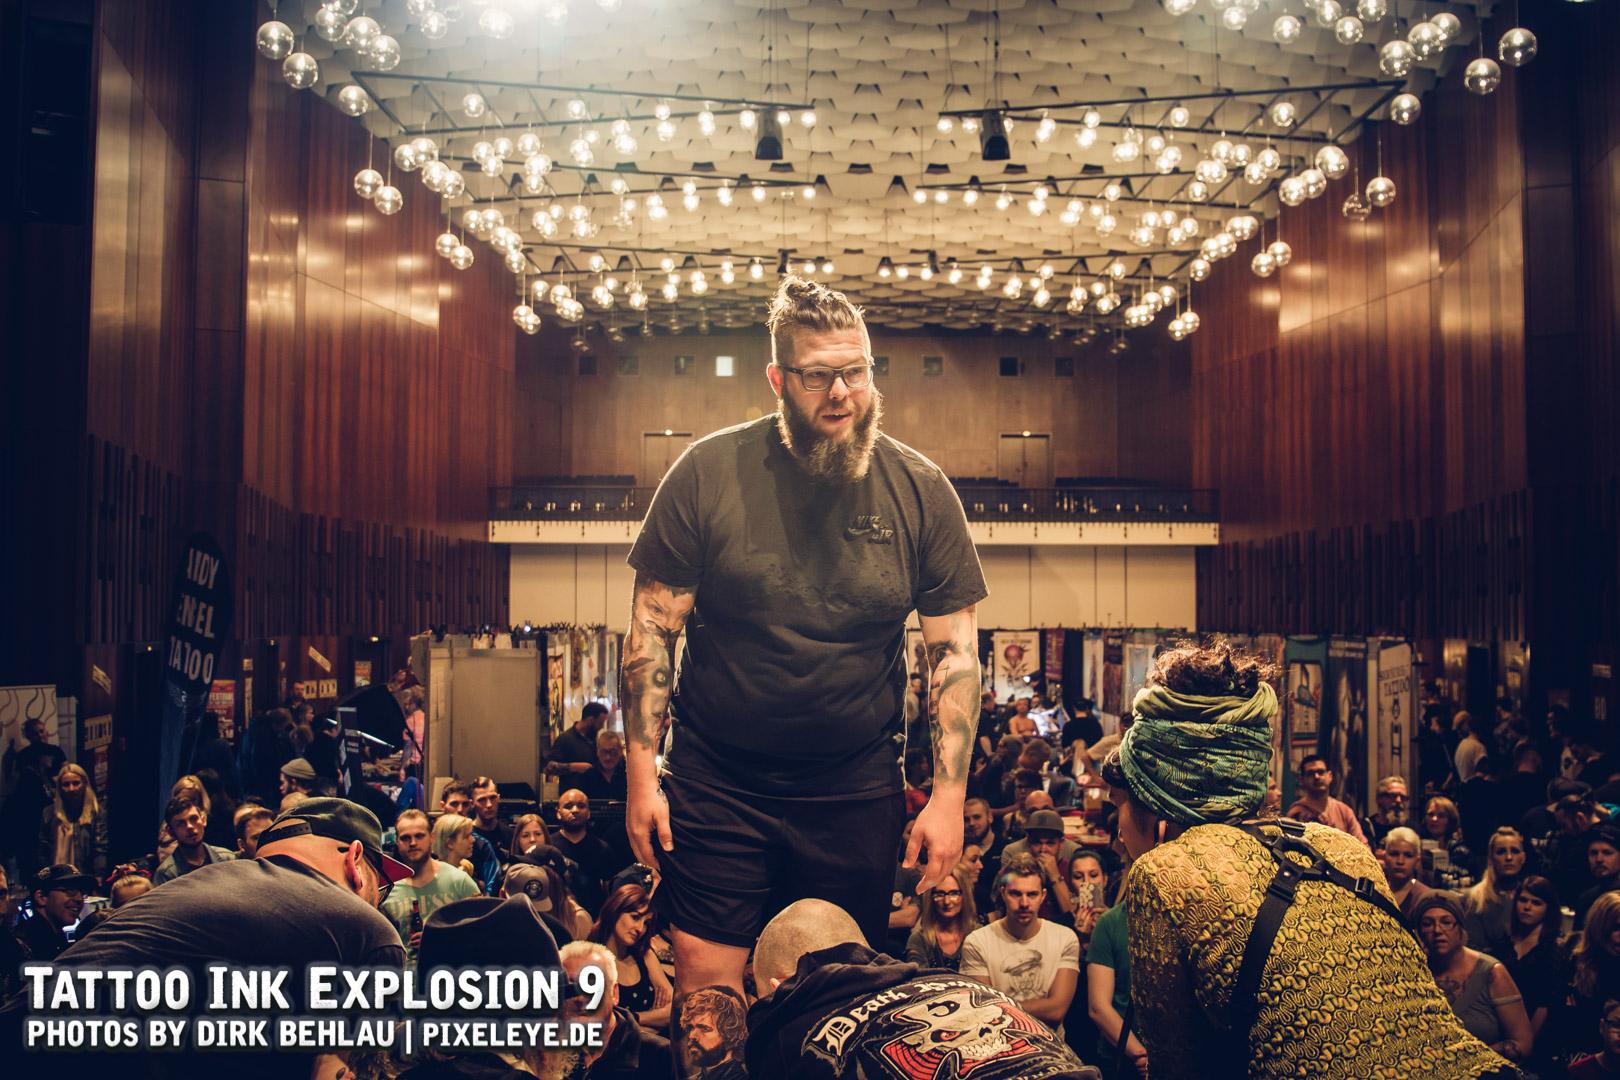 Tattoo Ink Explosion 2018 WEB by Dirk Behlau-1468.jpg